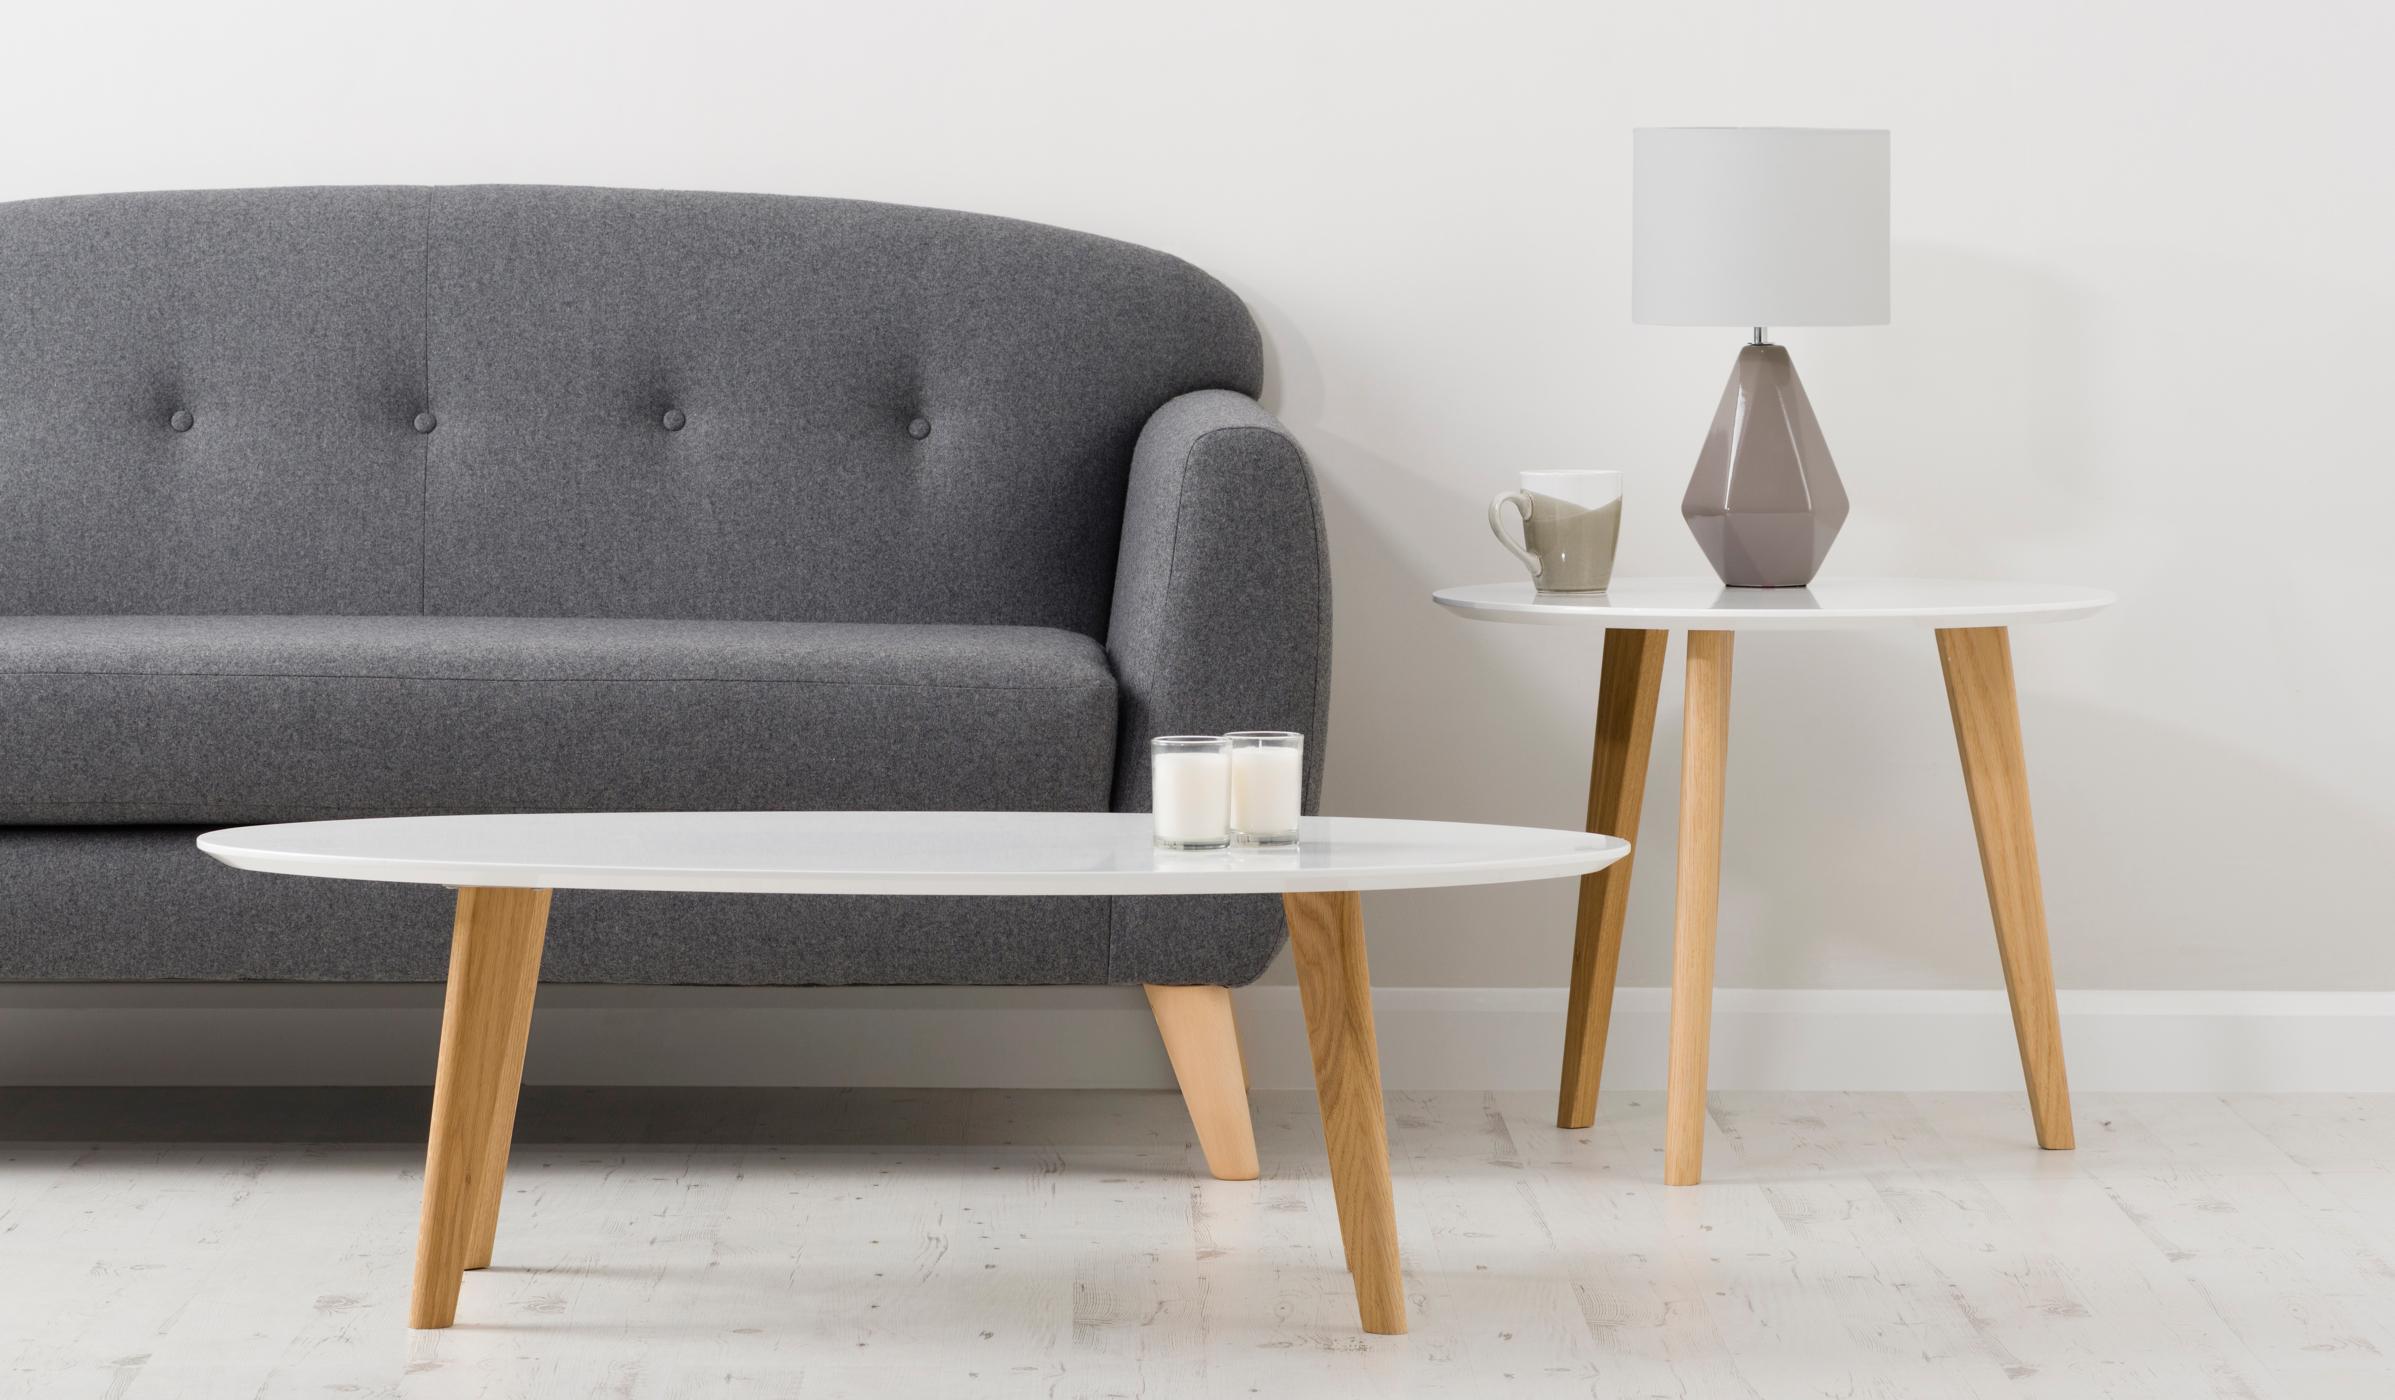 Living Room Furniture Brooklyn brooklyn living & dining furniture range - oak and white | kitchen